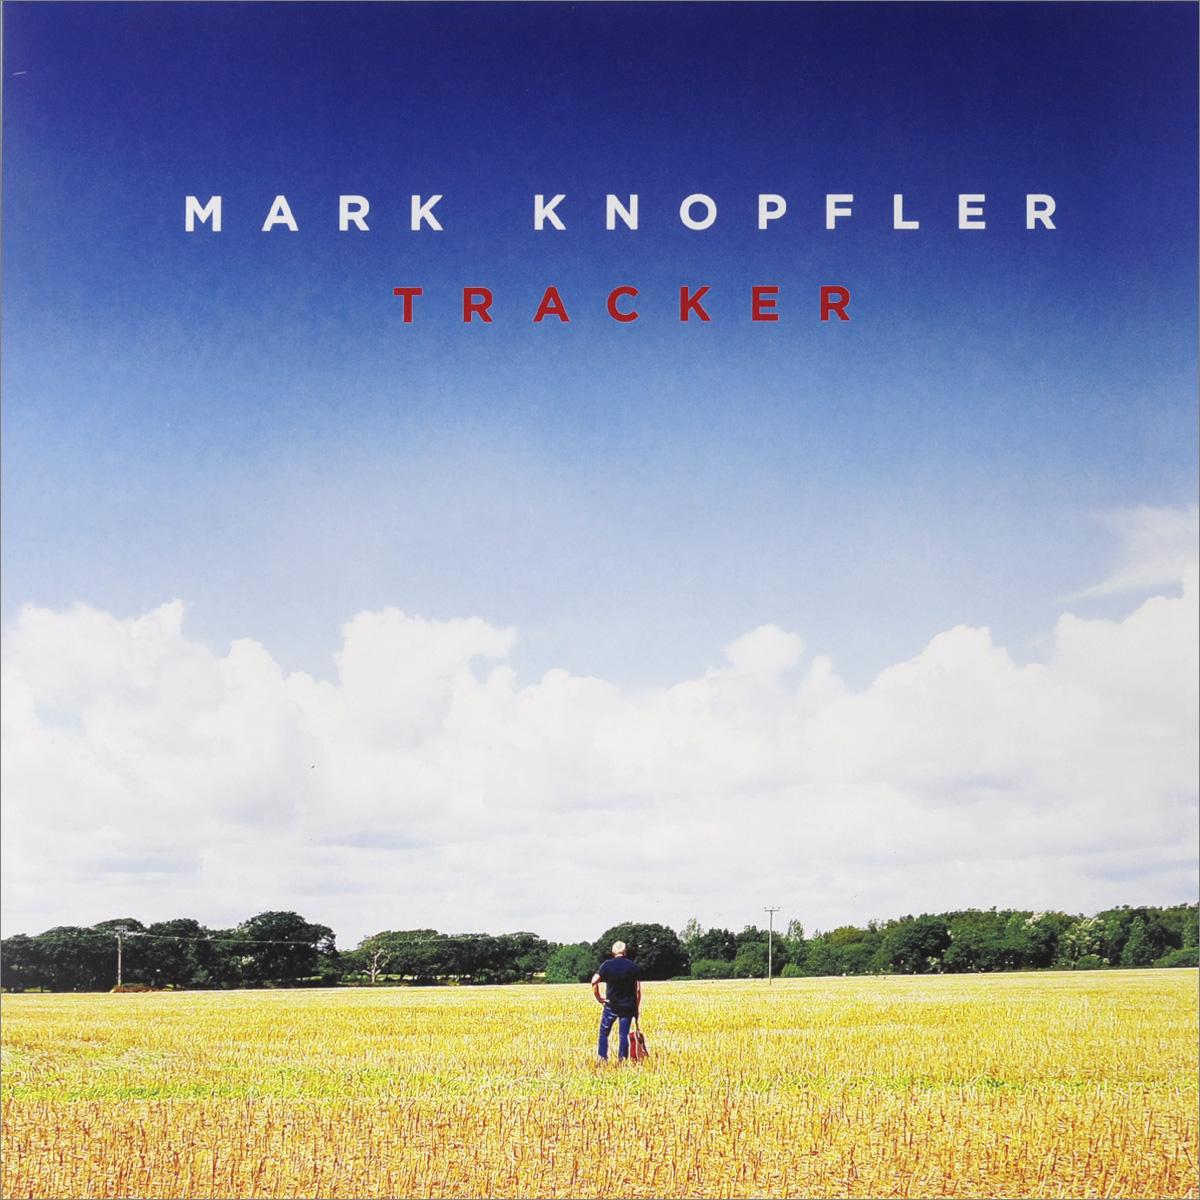 Марк Нопфлер Mark Knopfler. Tracker (2 LP) honest jons shangaan electro 2 lp